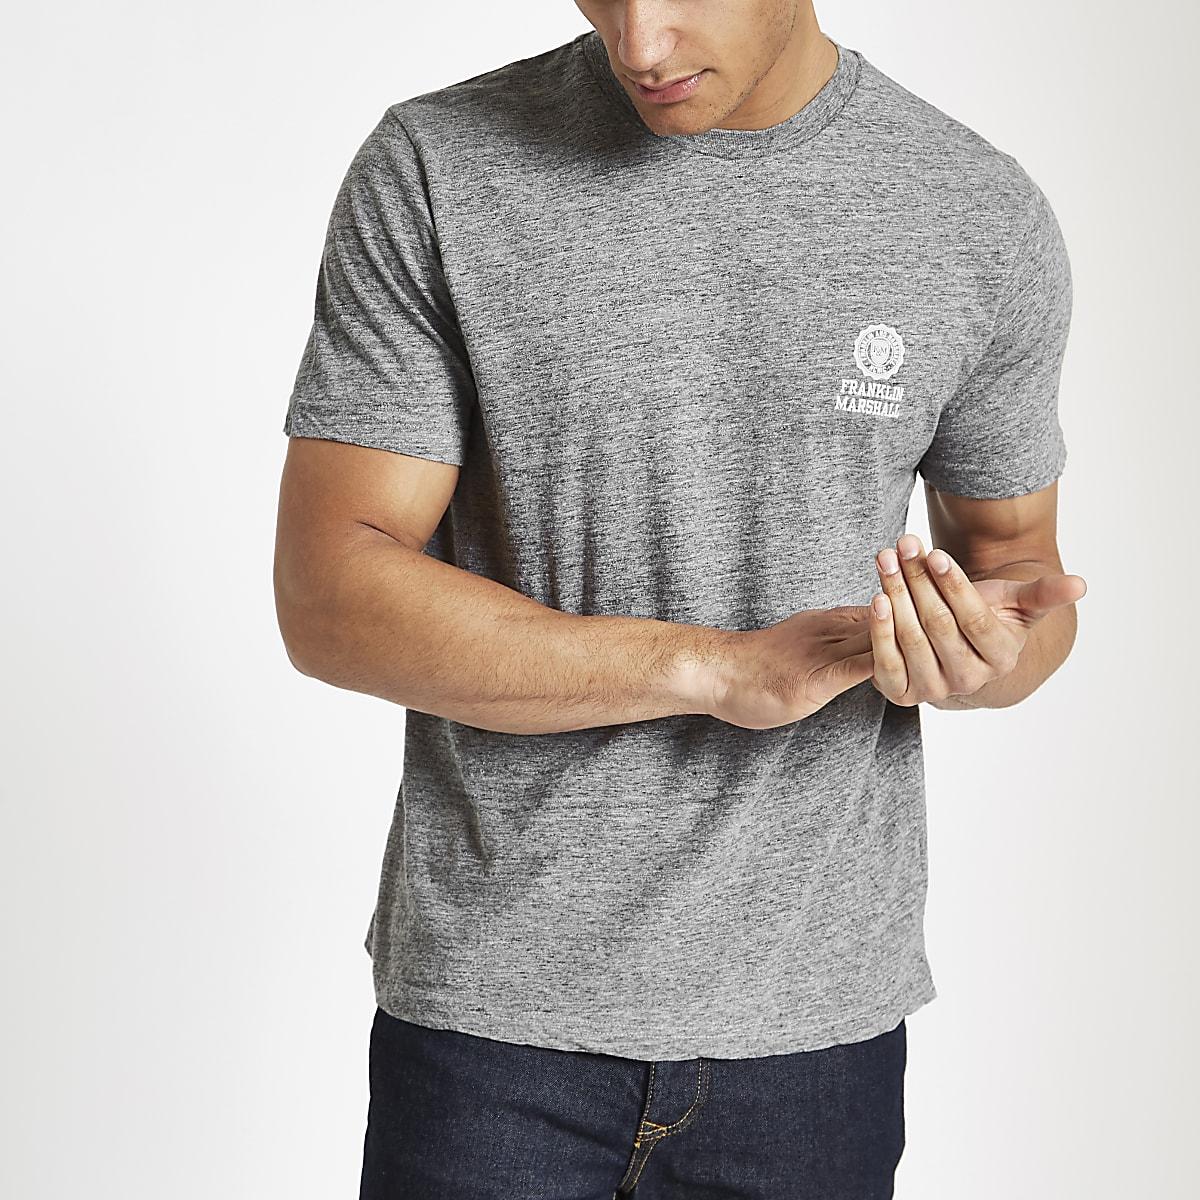 Franklin & Marshall – T-shirt gris à logo sur la poitrine